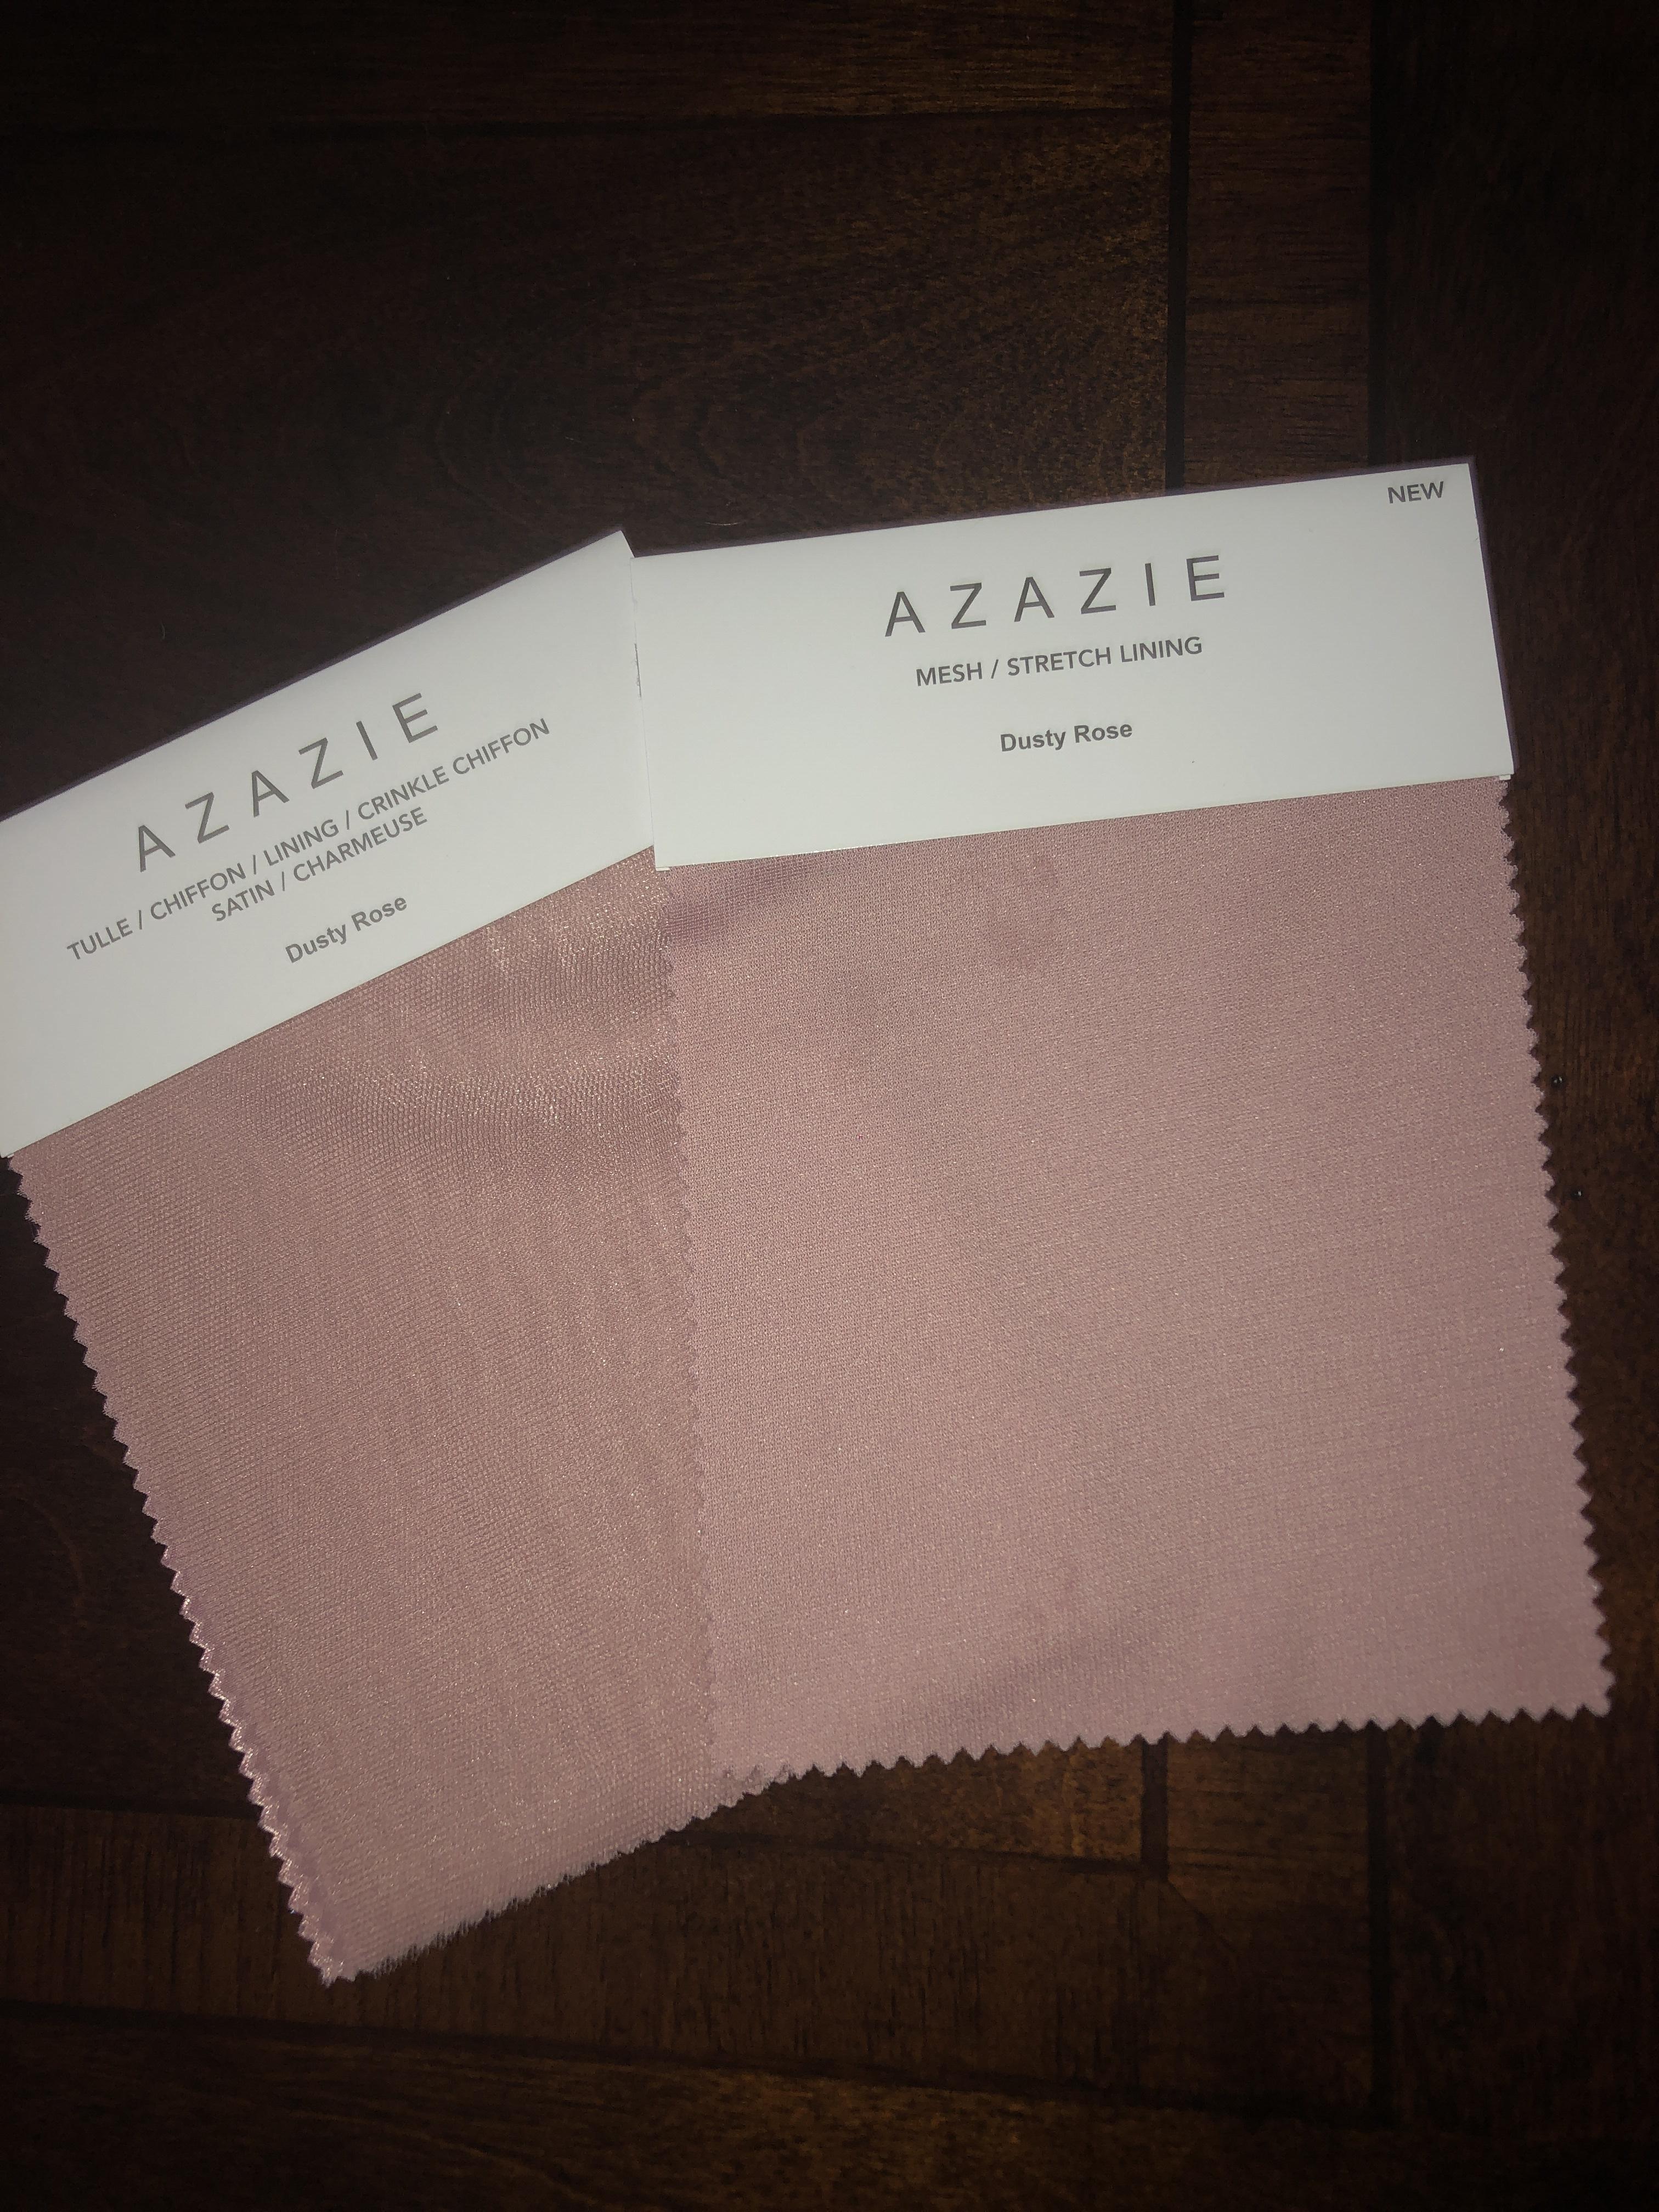 d9783dc1ef3b Azazie Swatches - Bridesmaids & Wedding Party Swatches | Azazie